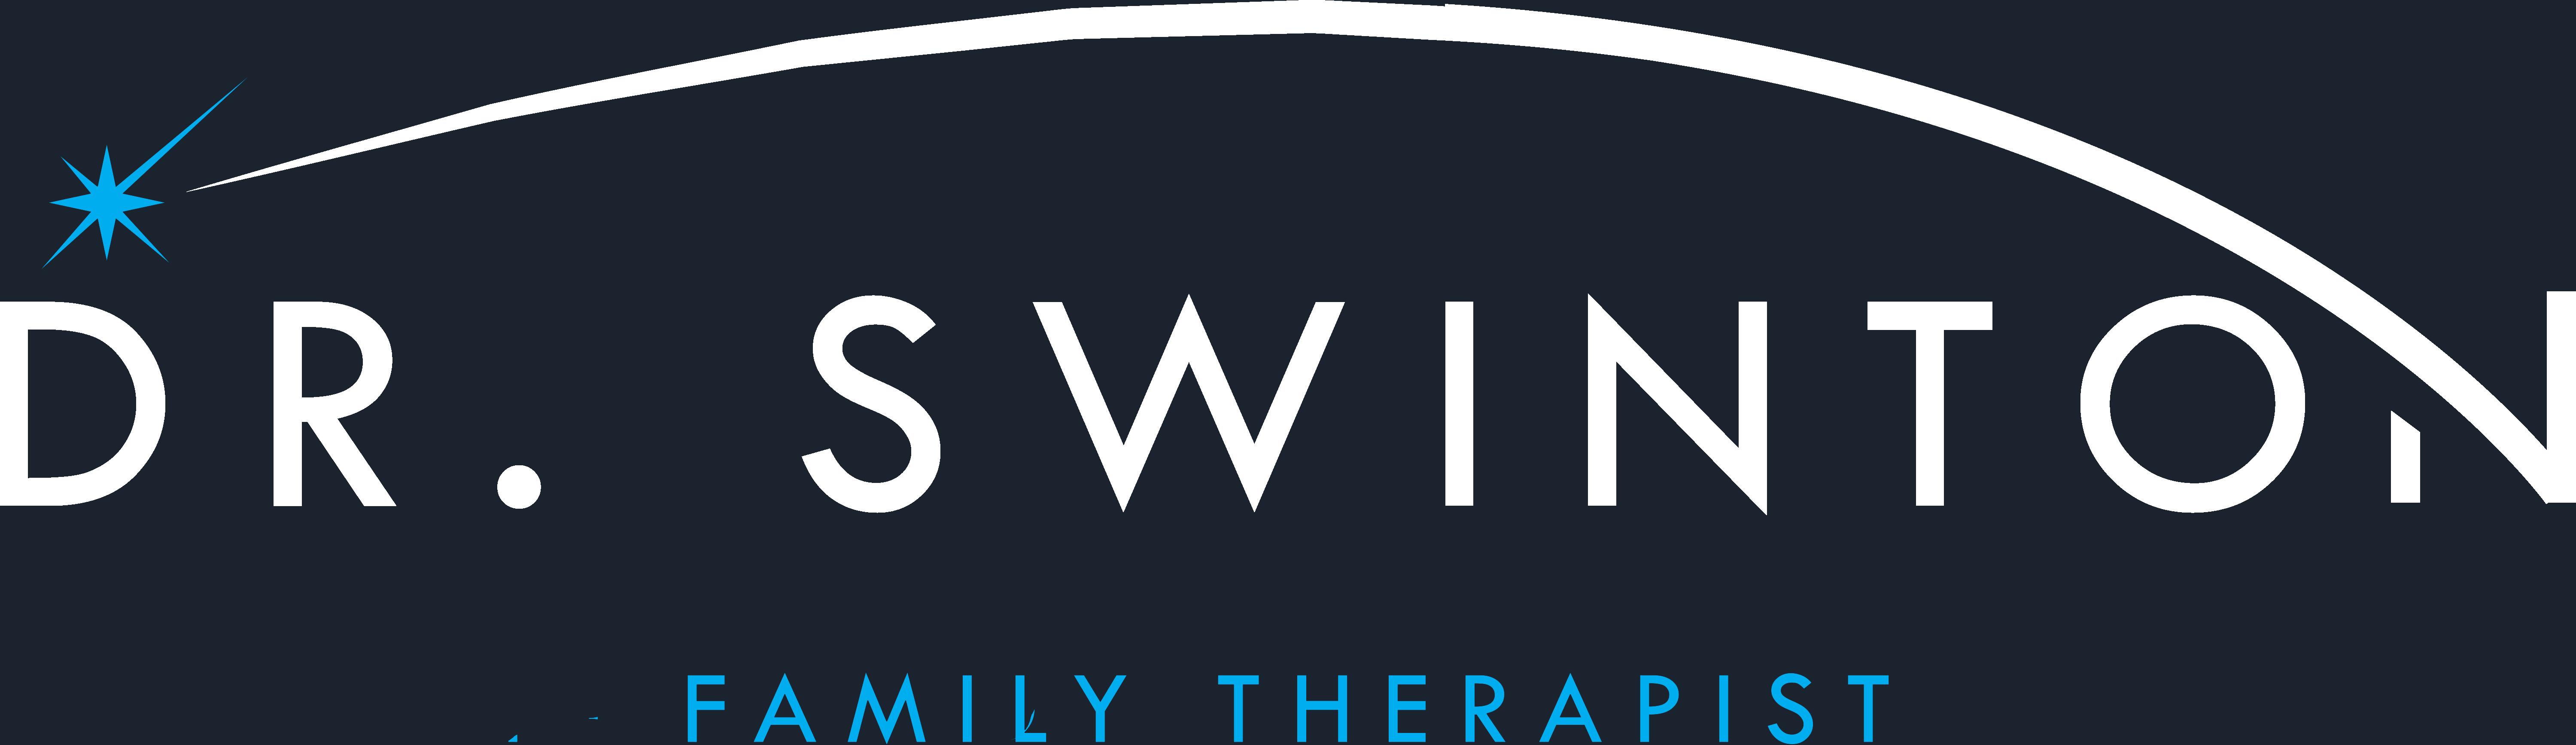 Dr. Swinton